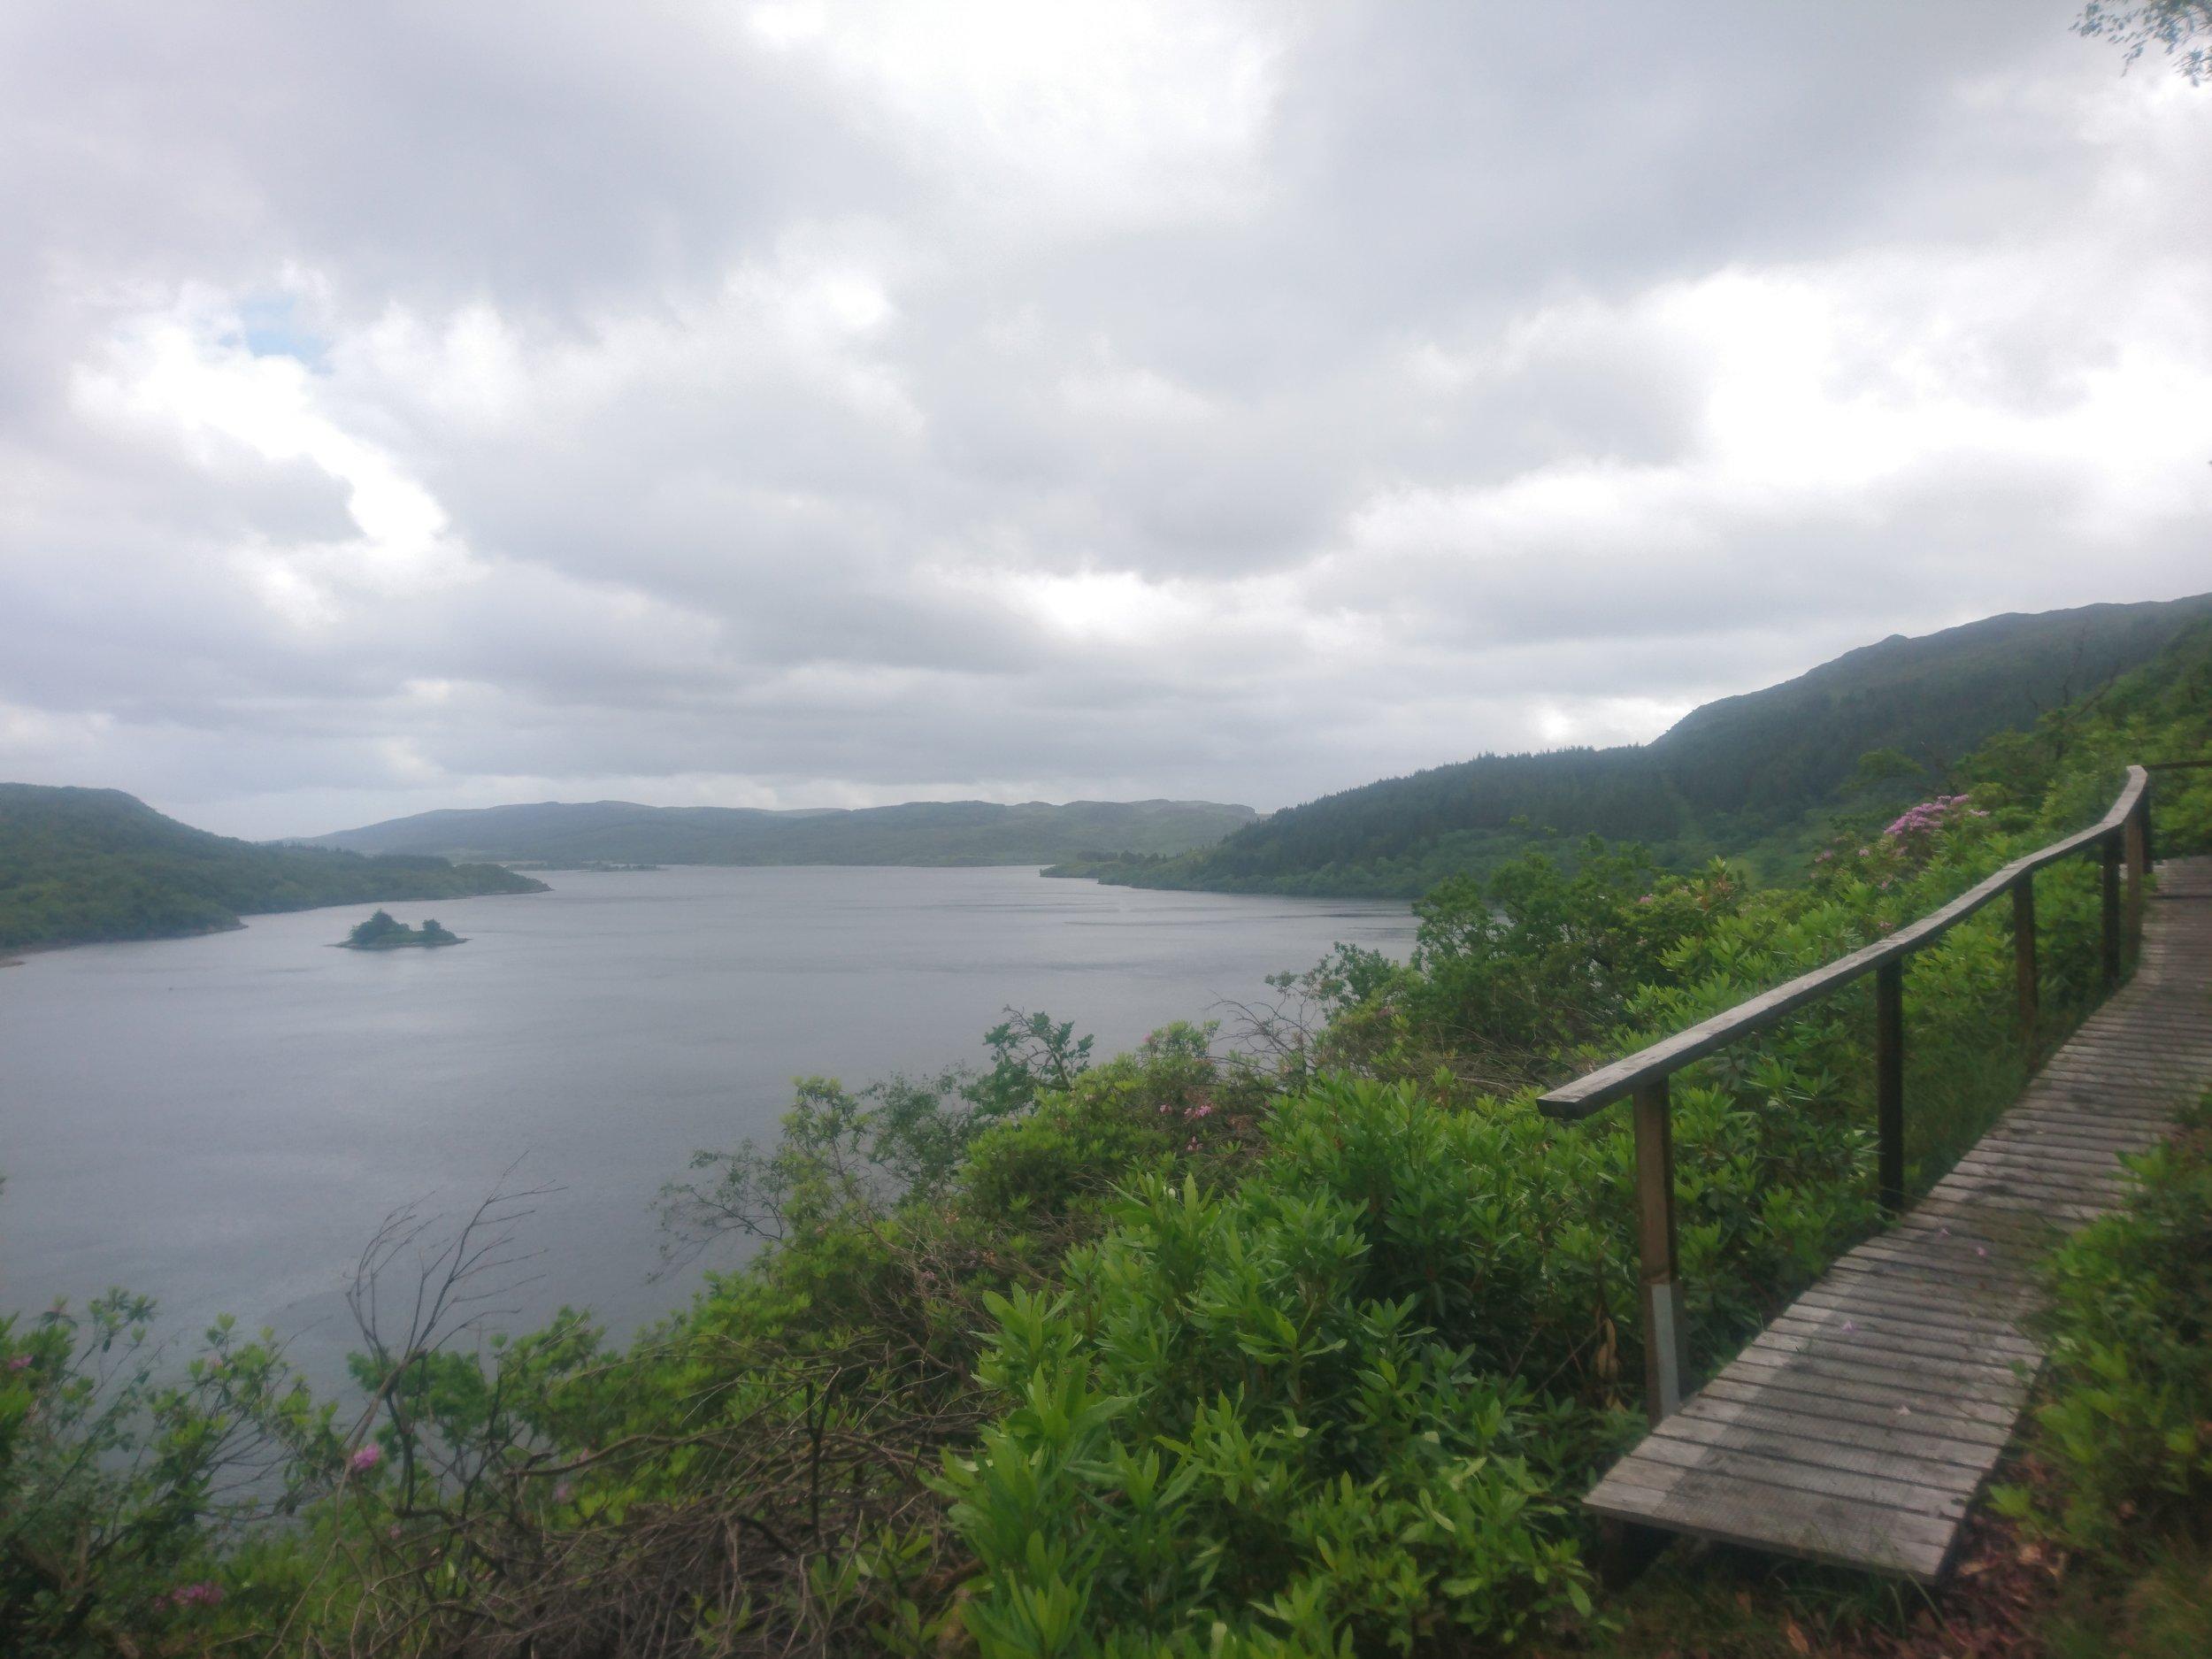 Boardwalk high above Loch